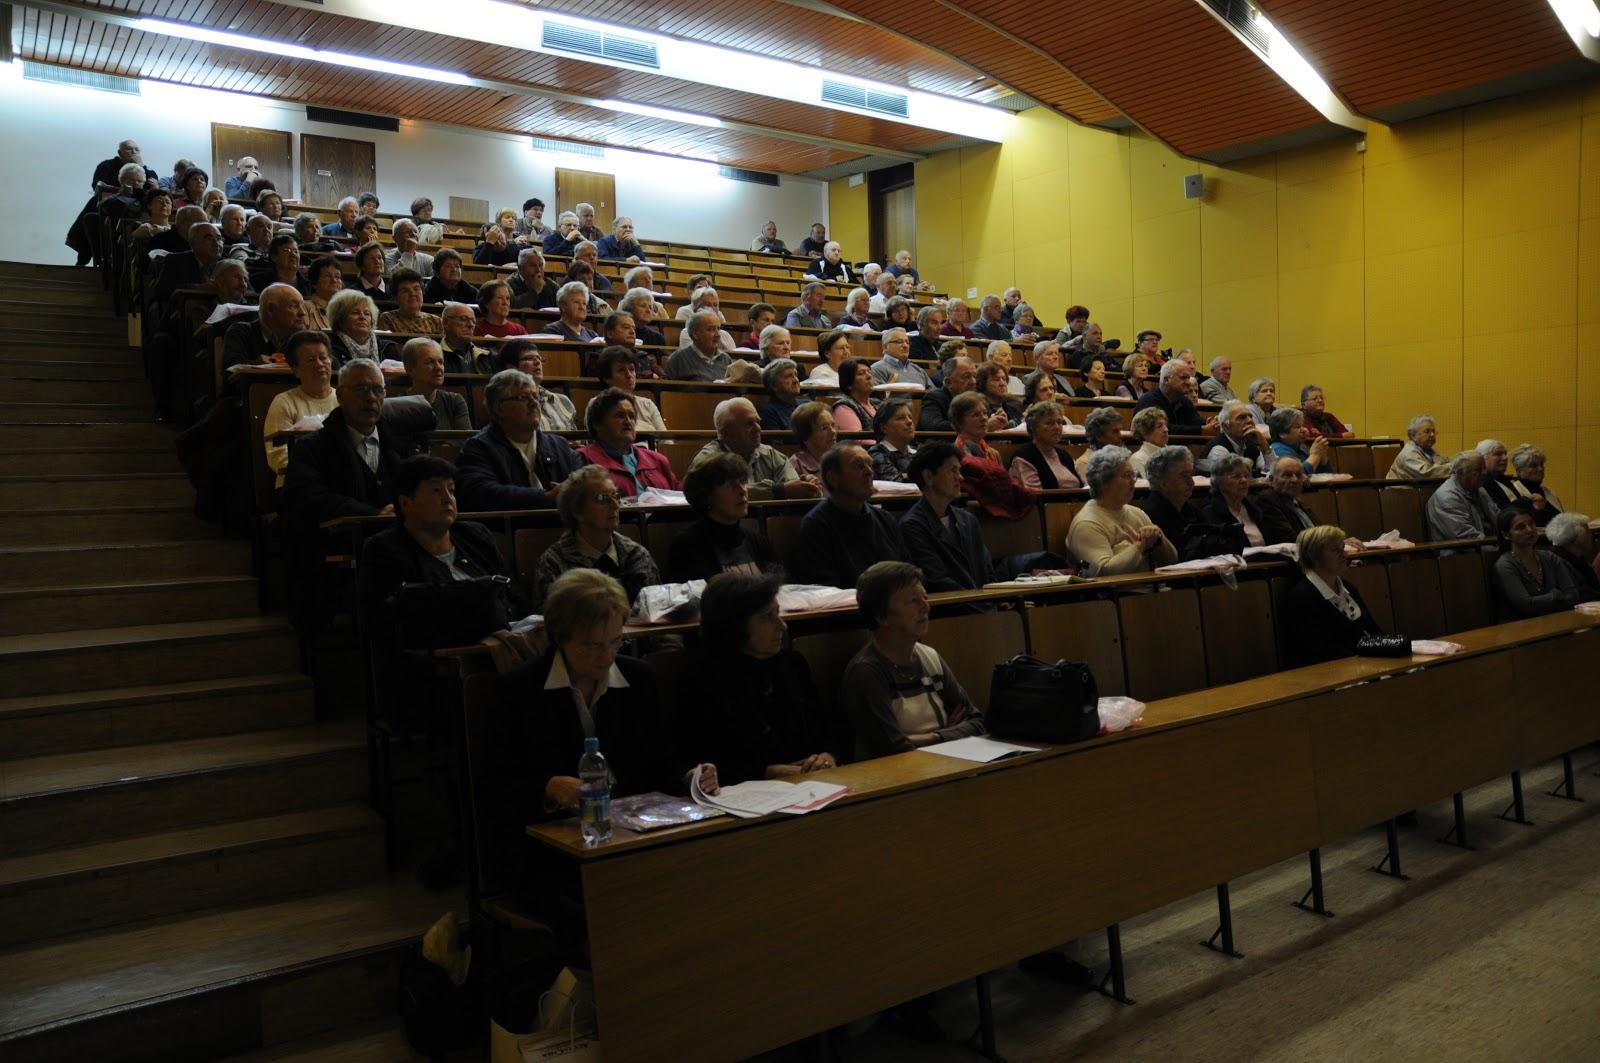 Predavanje, dr. Camlek - oktober 2011 - DSC_3874.JPG